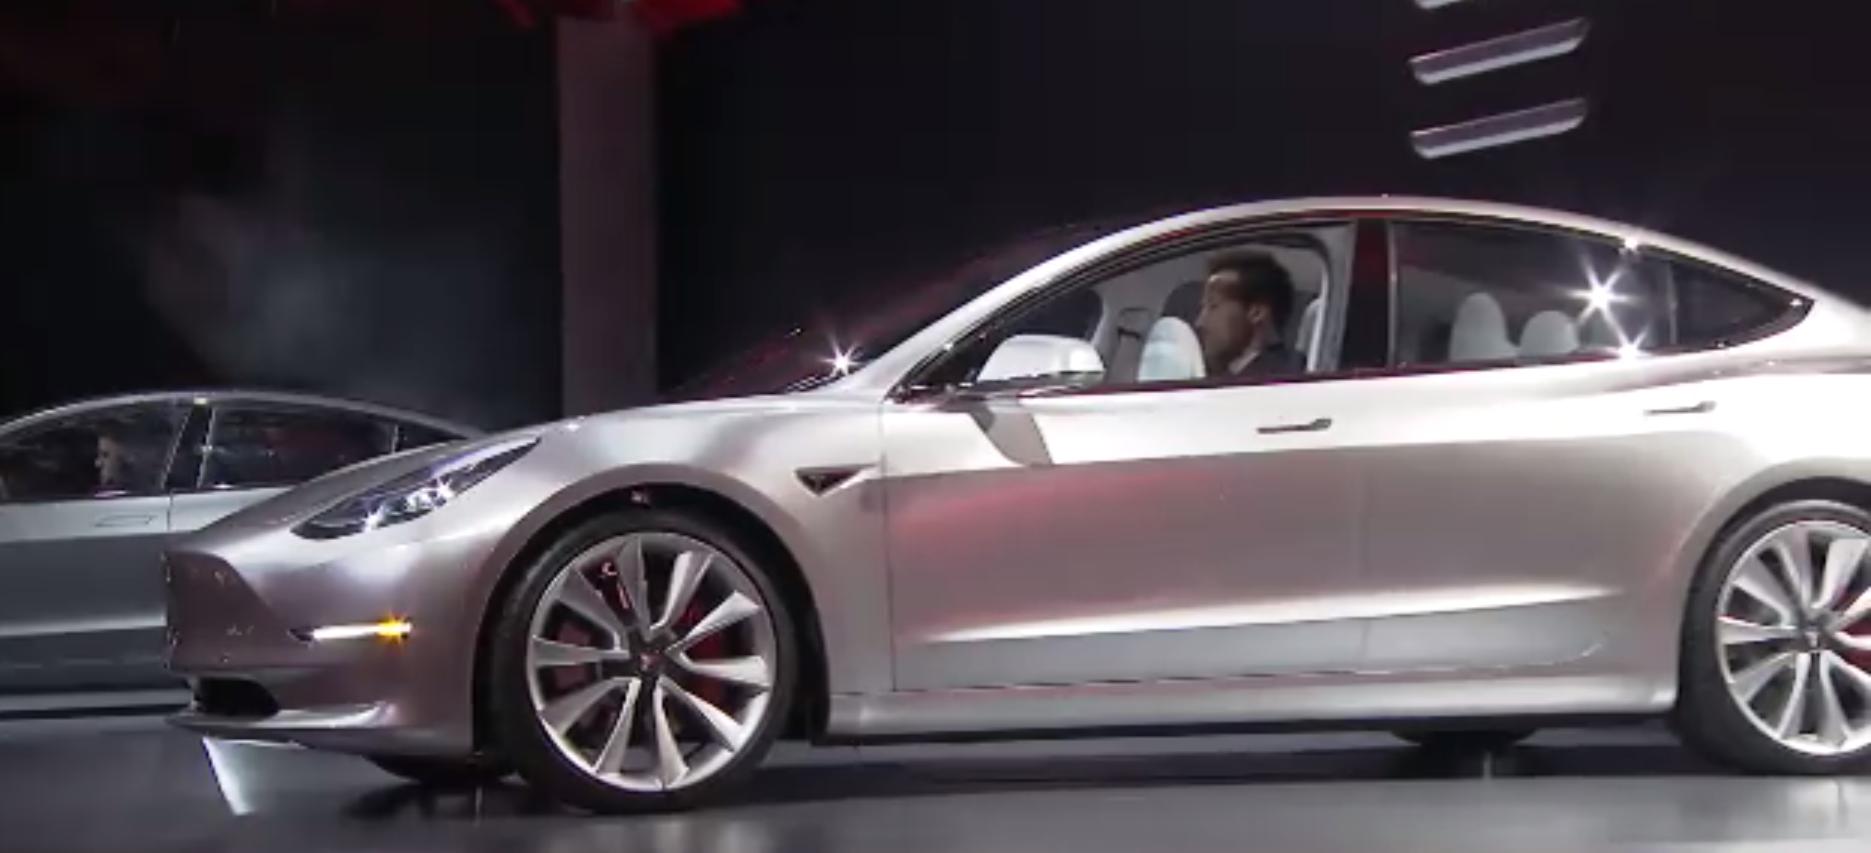 Tesla Model 3 Unveil 🔊 2016-03-31 22-55-29